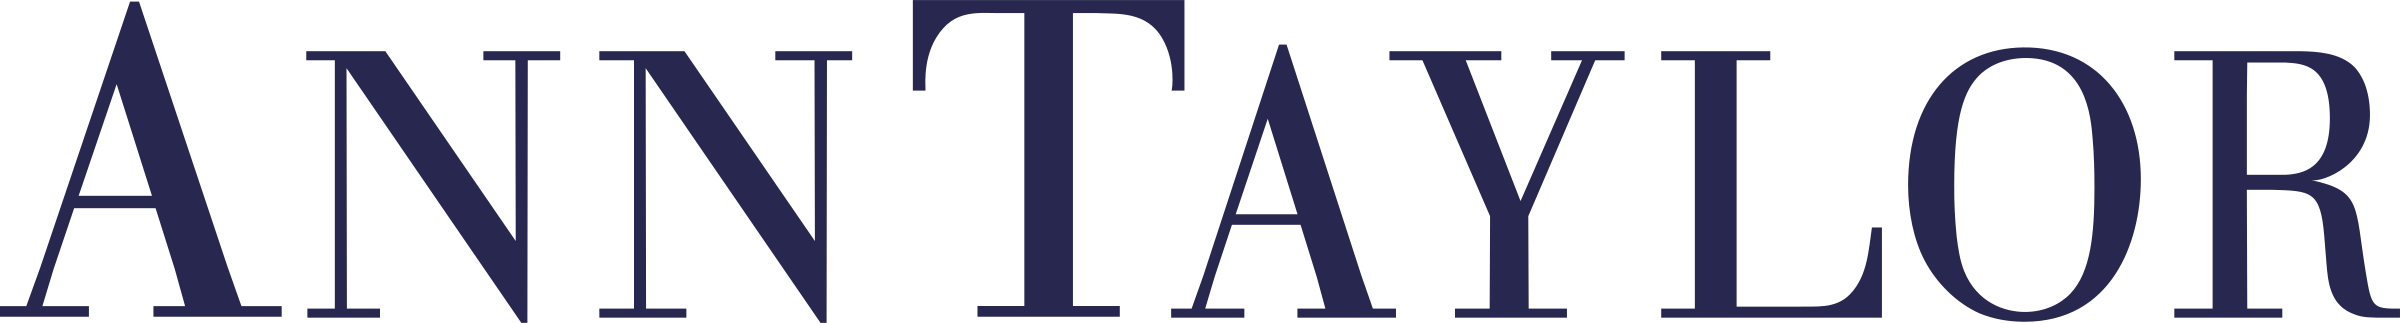 ANN TAYLOR 1 Logo PNG Transparent & SVG Vector.